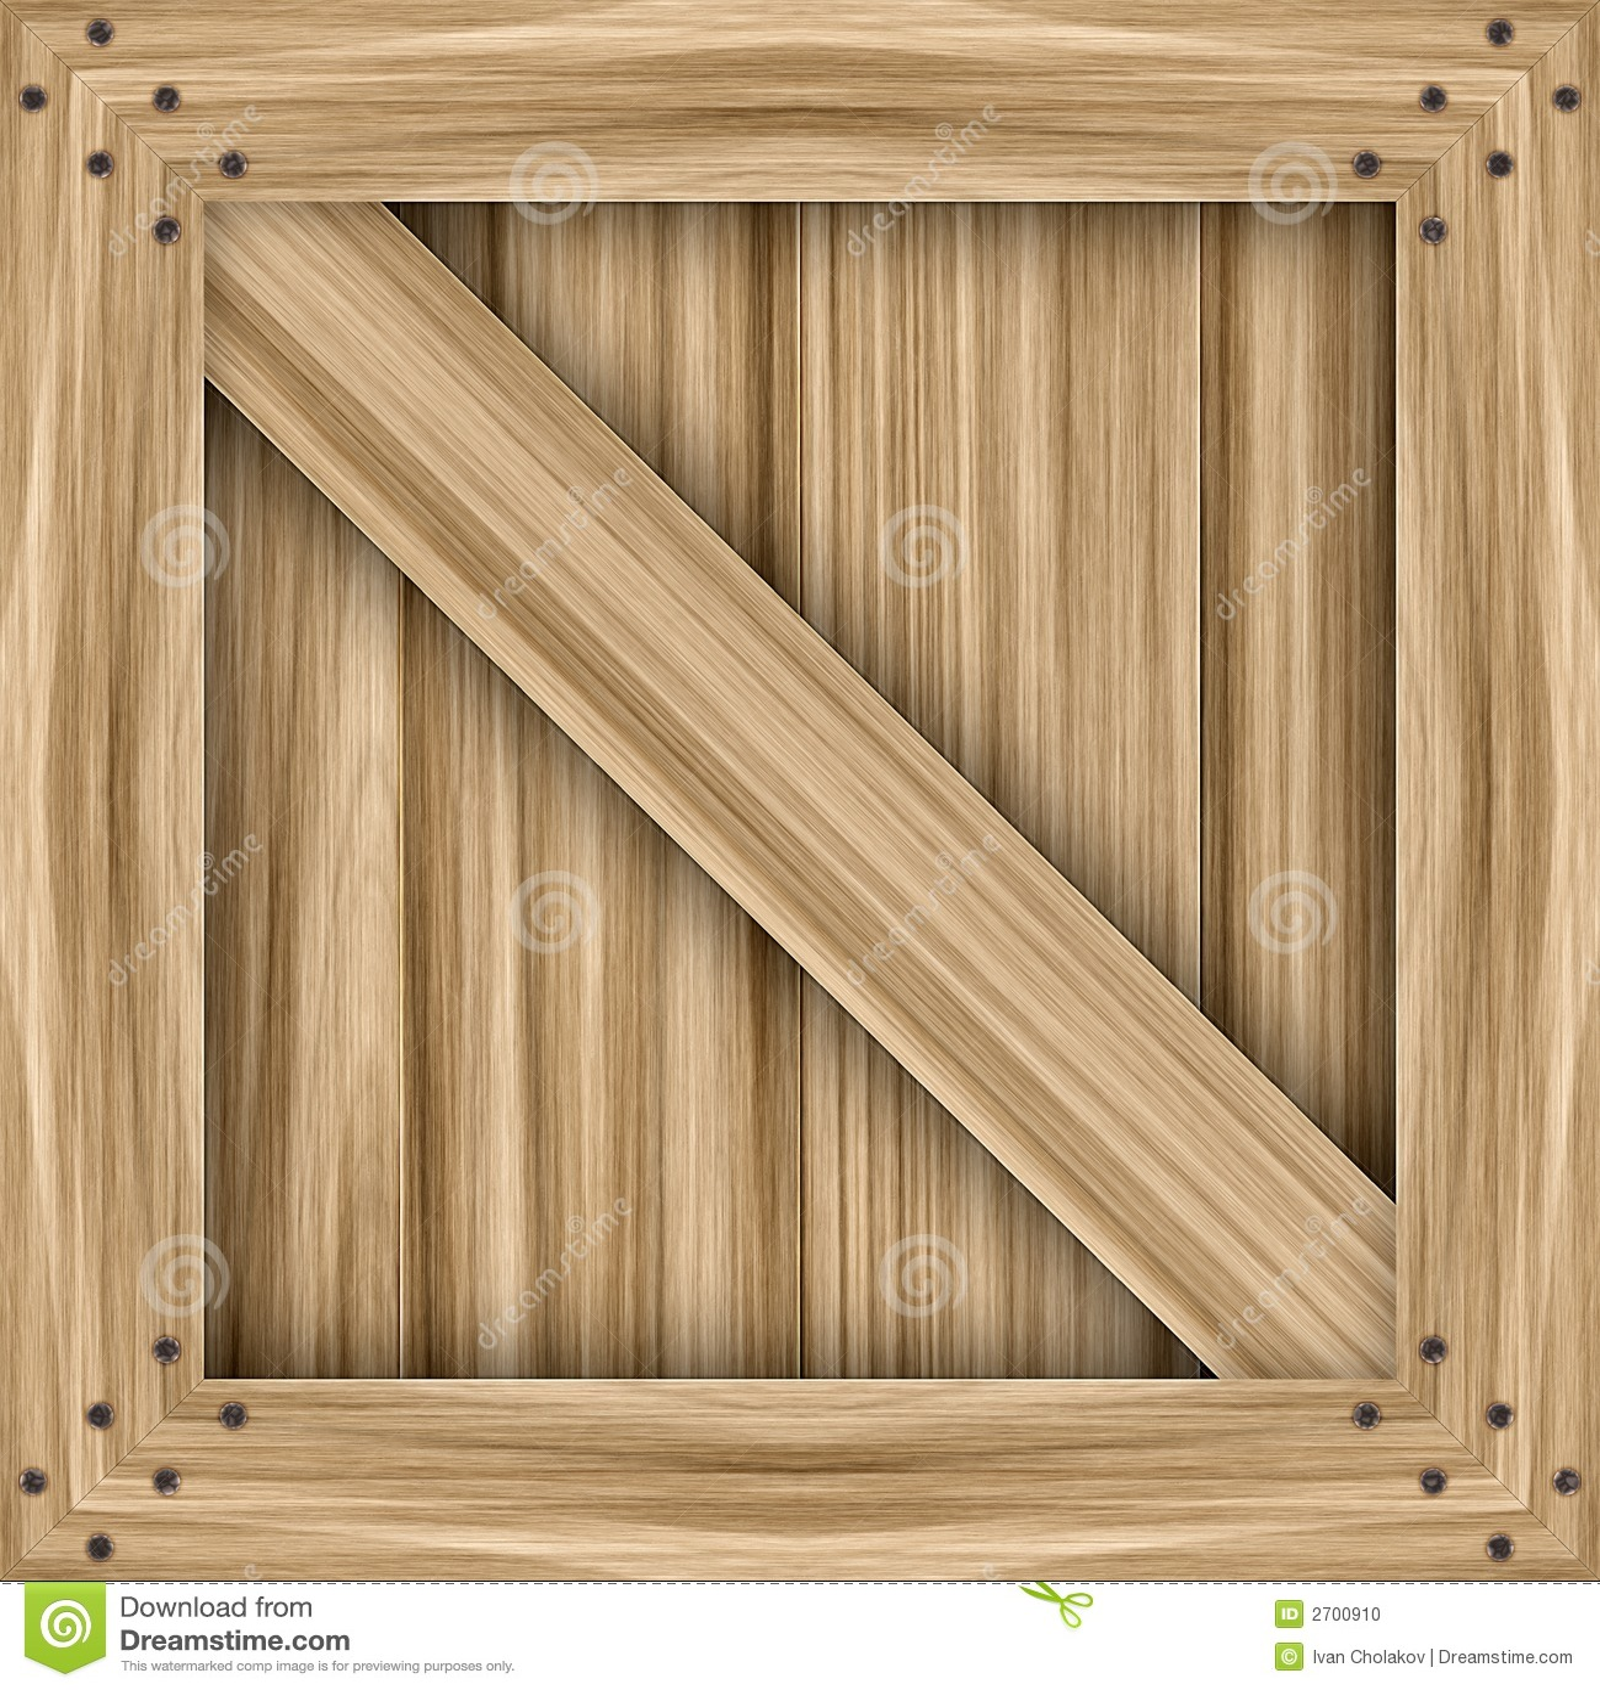 wooden crate stock illustration illustration of commerce 2700910